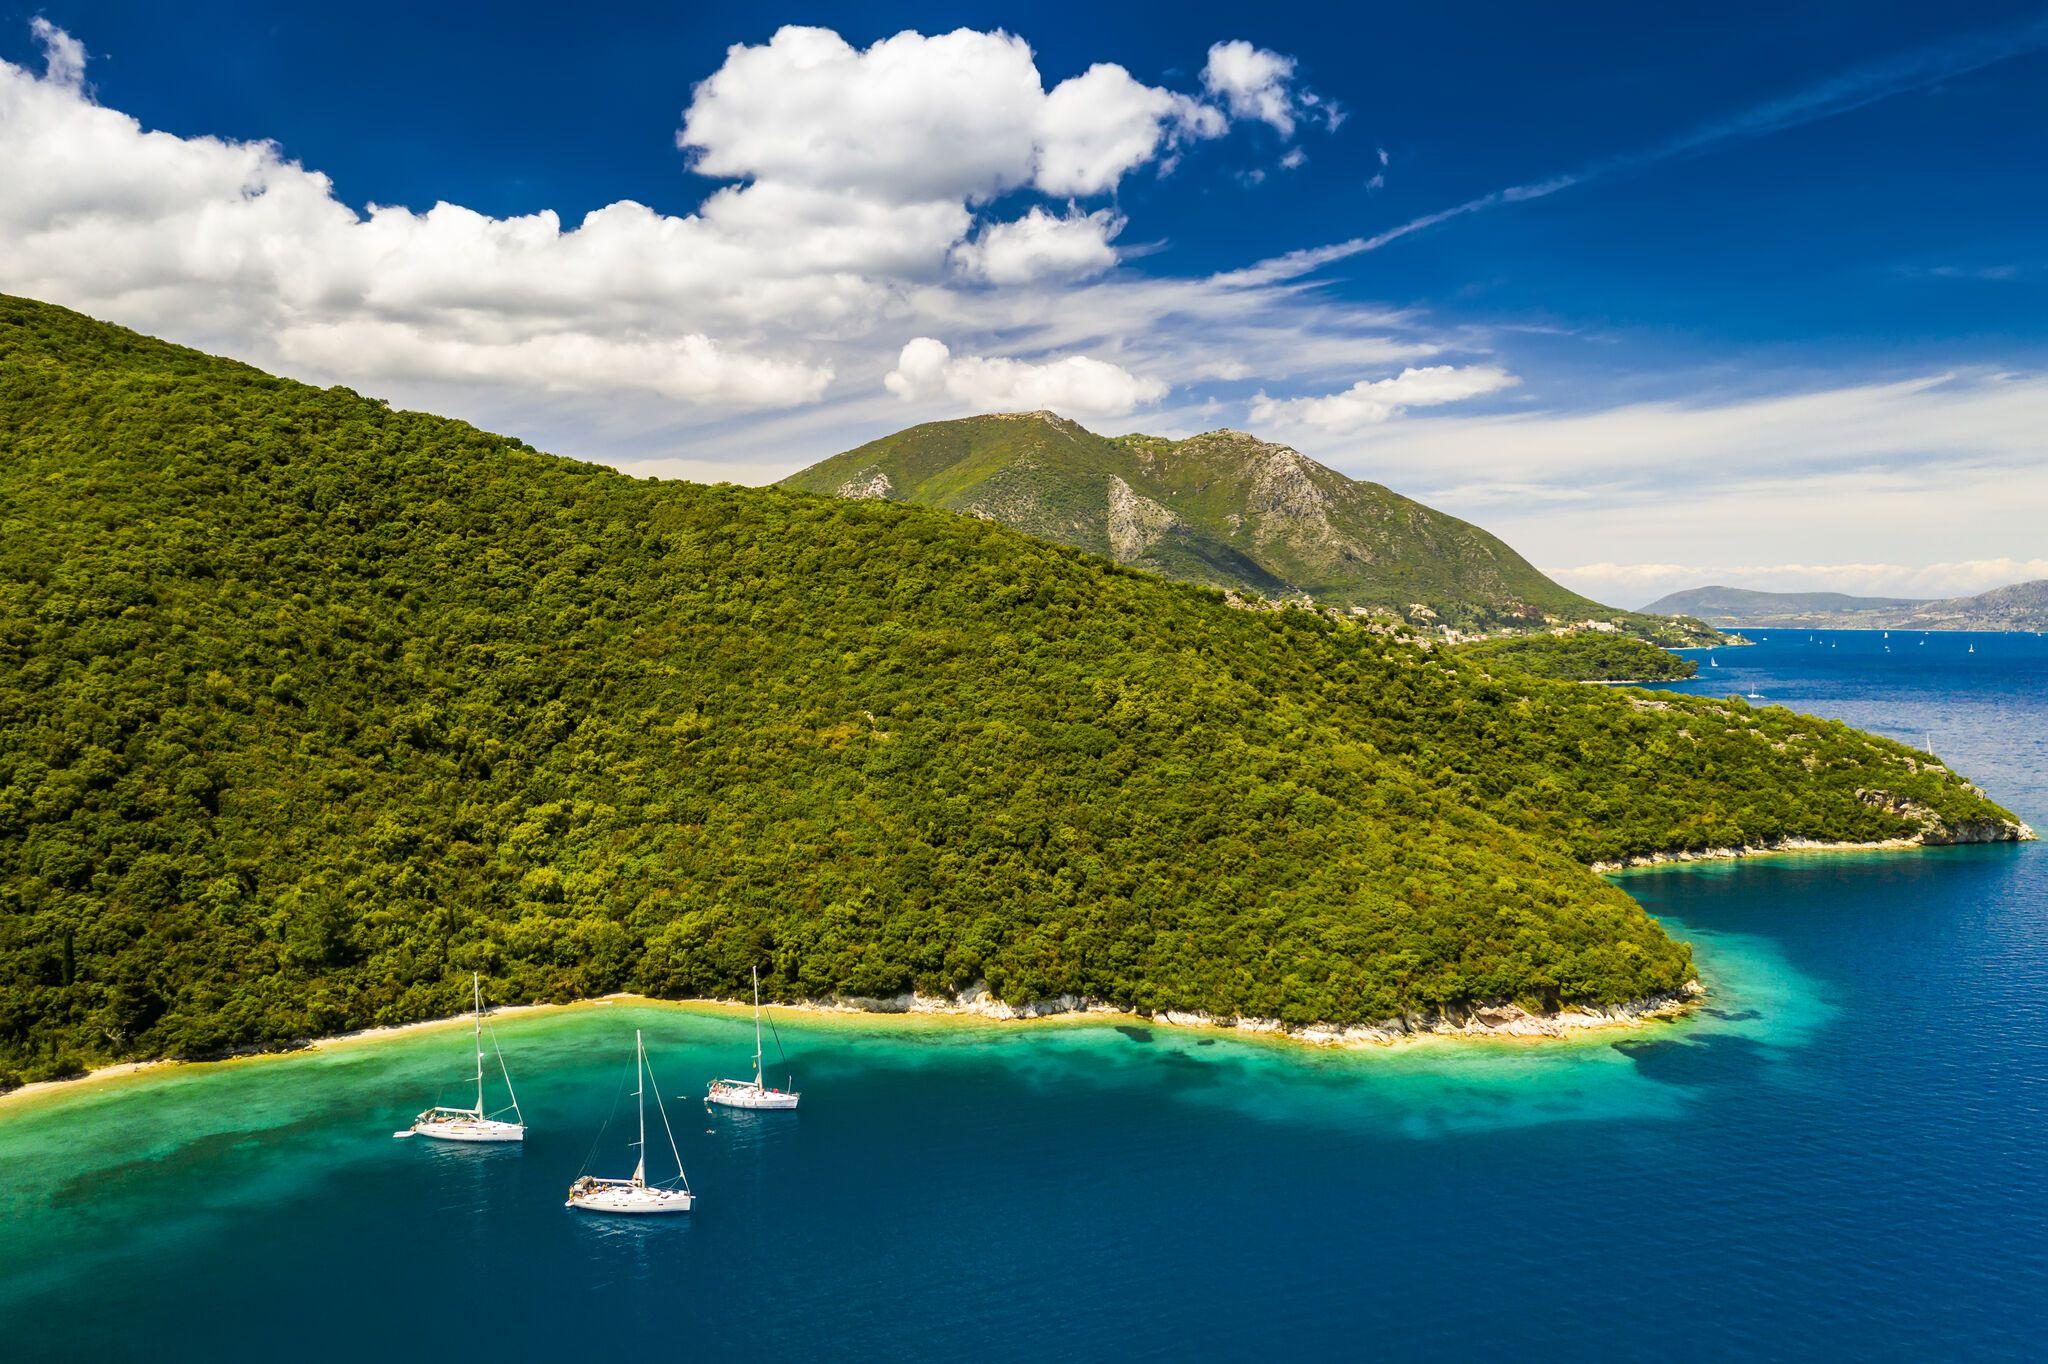 Ionian Islands Yacht Charter Aboard Bellacha 2020 Ionian